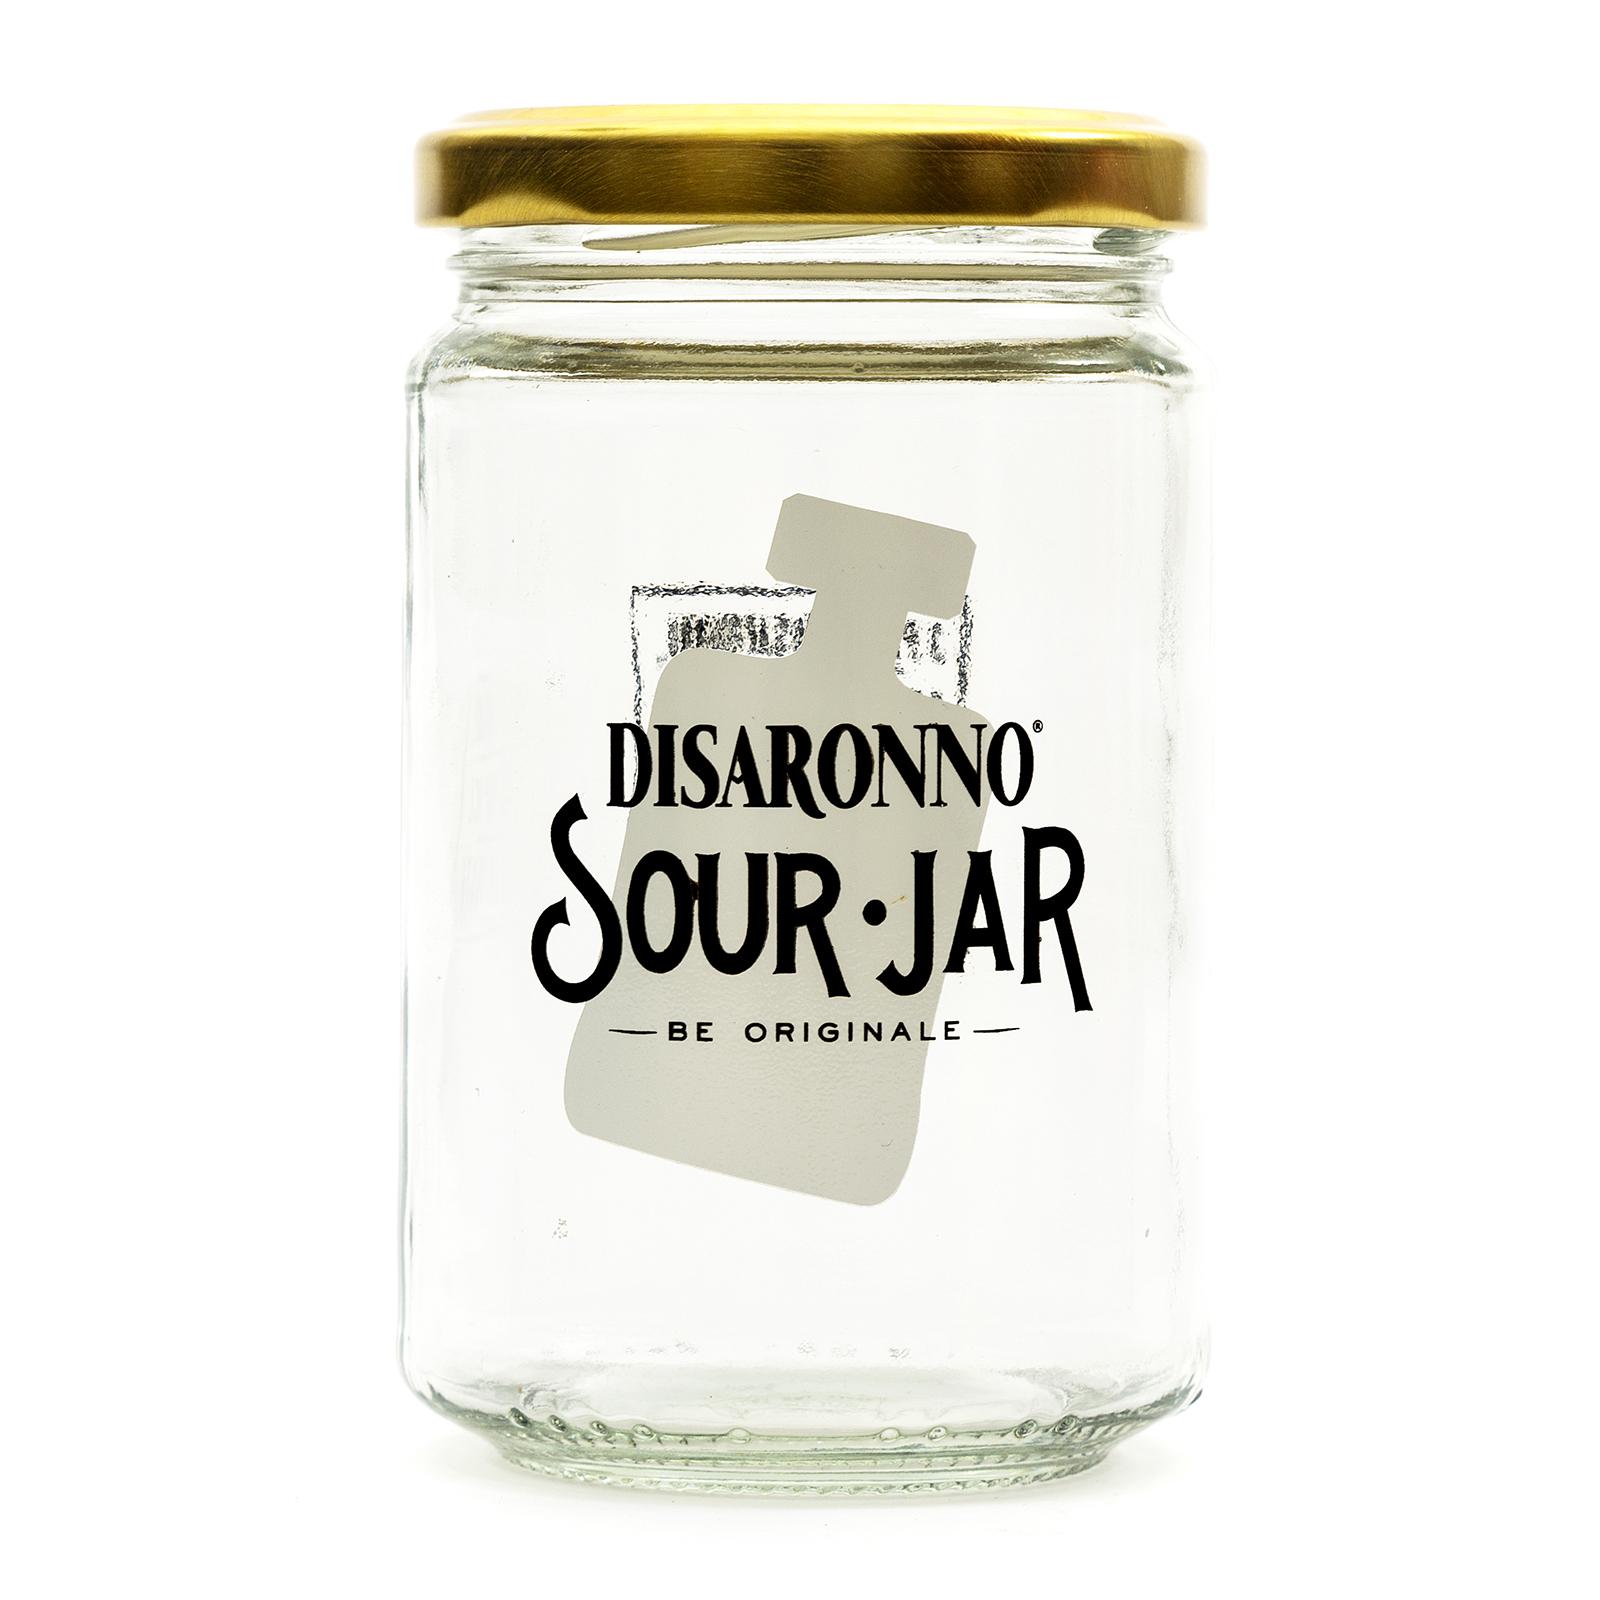 Details about Genuine Limited Edition Disaronno Sour Cocktail Jar +  Presentation Box Home Bar